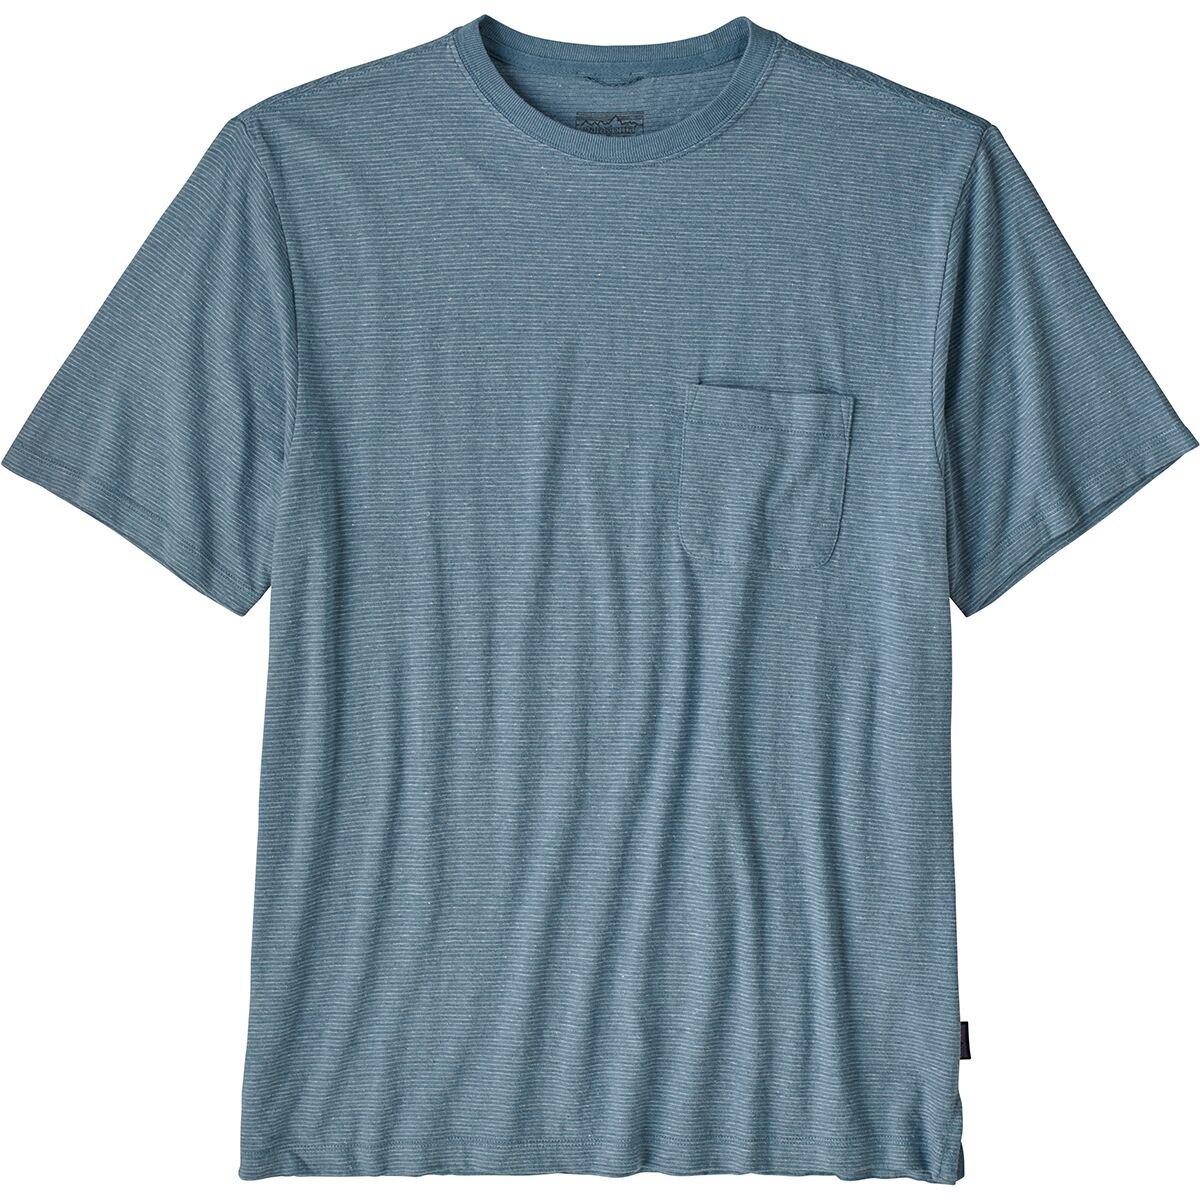 Trail Harbor Pocket T-Shirt - Men